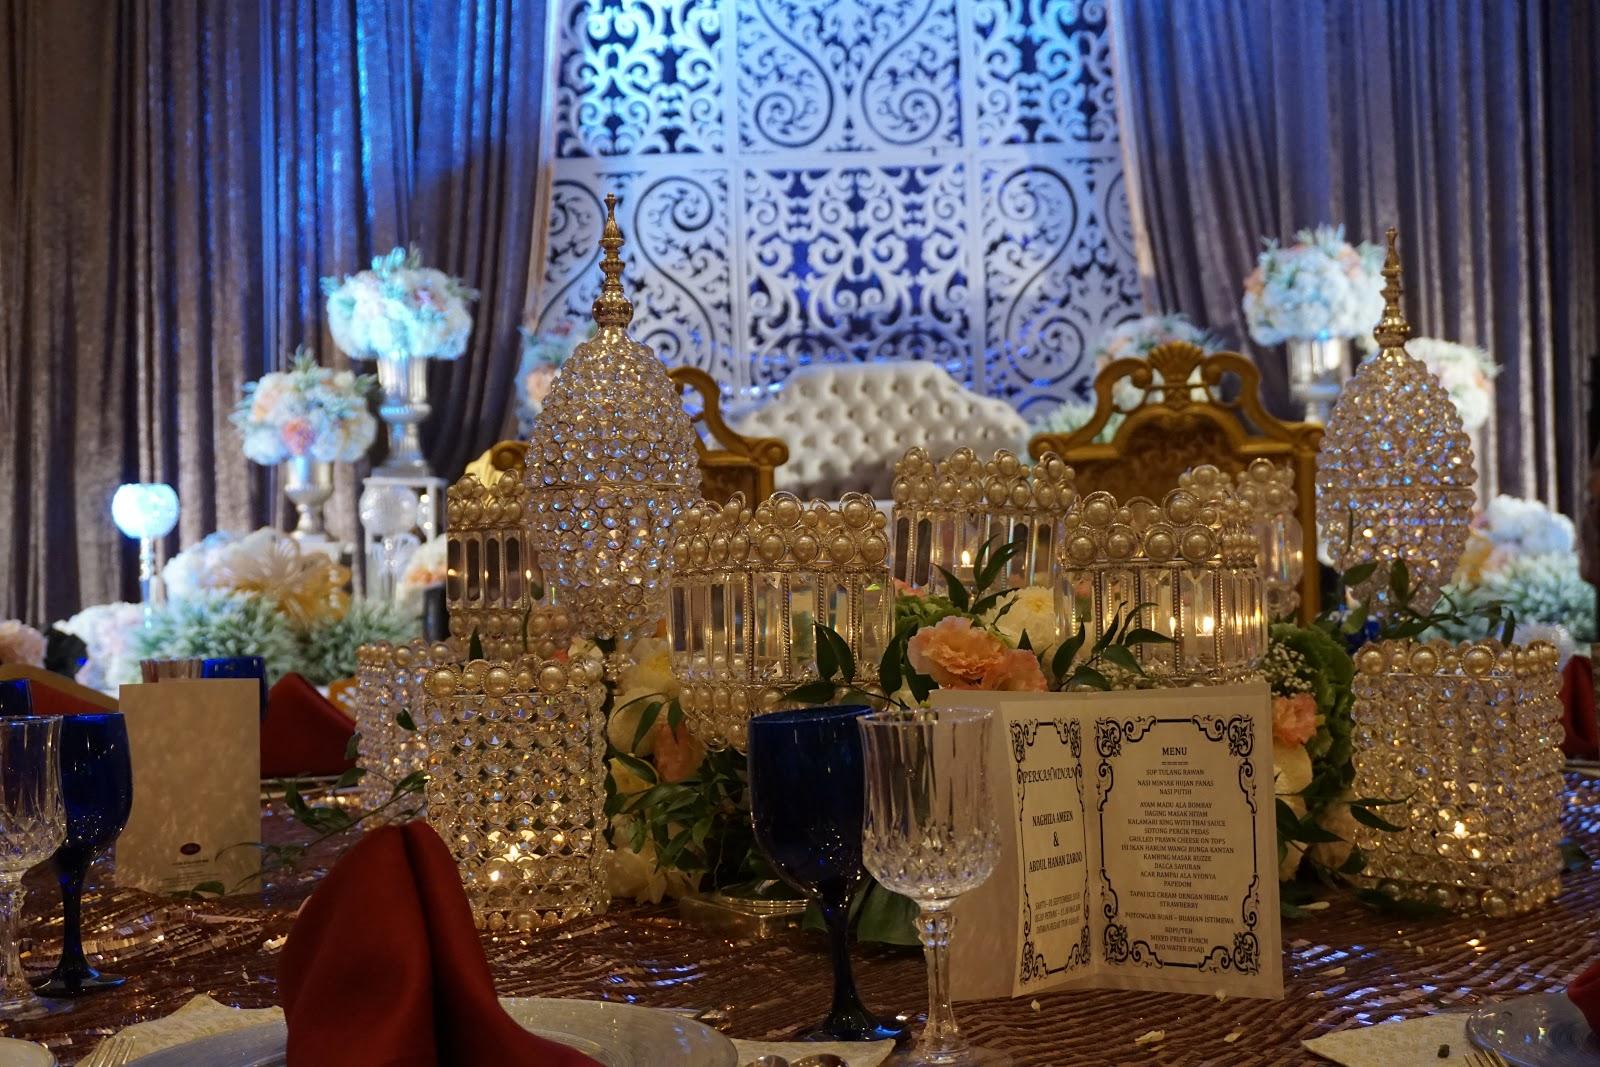 bridal, FUSION BRIDAL, PERANCANG PERKAHWINAN, PERKAHWINAN, PERUNDING PERKAHWINAN, SIDRA FAZEELAT, WEDDING,